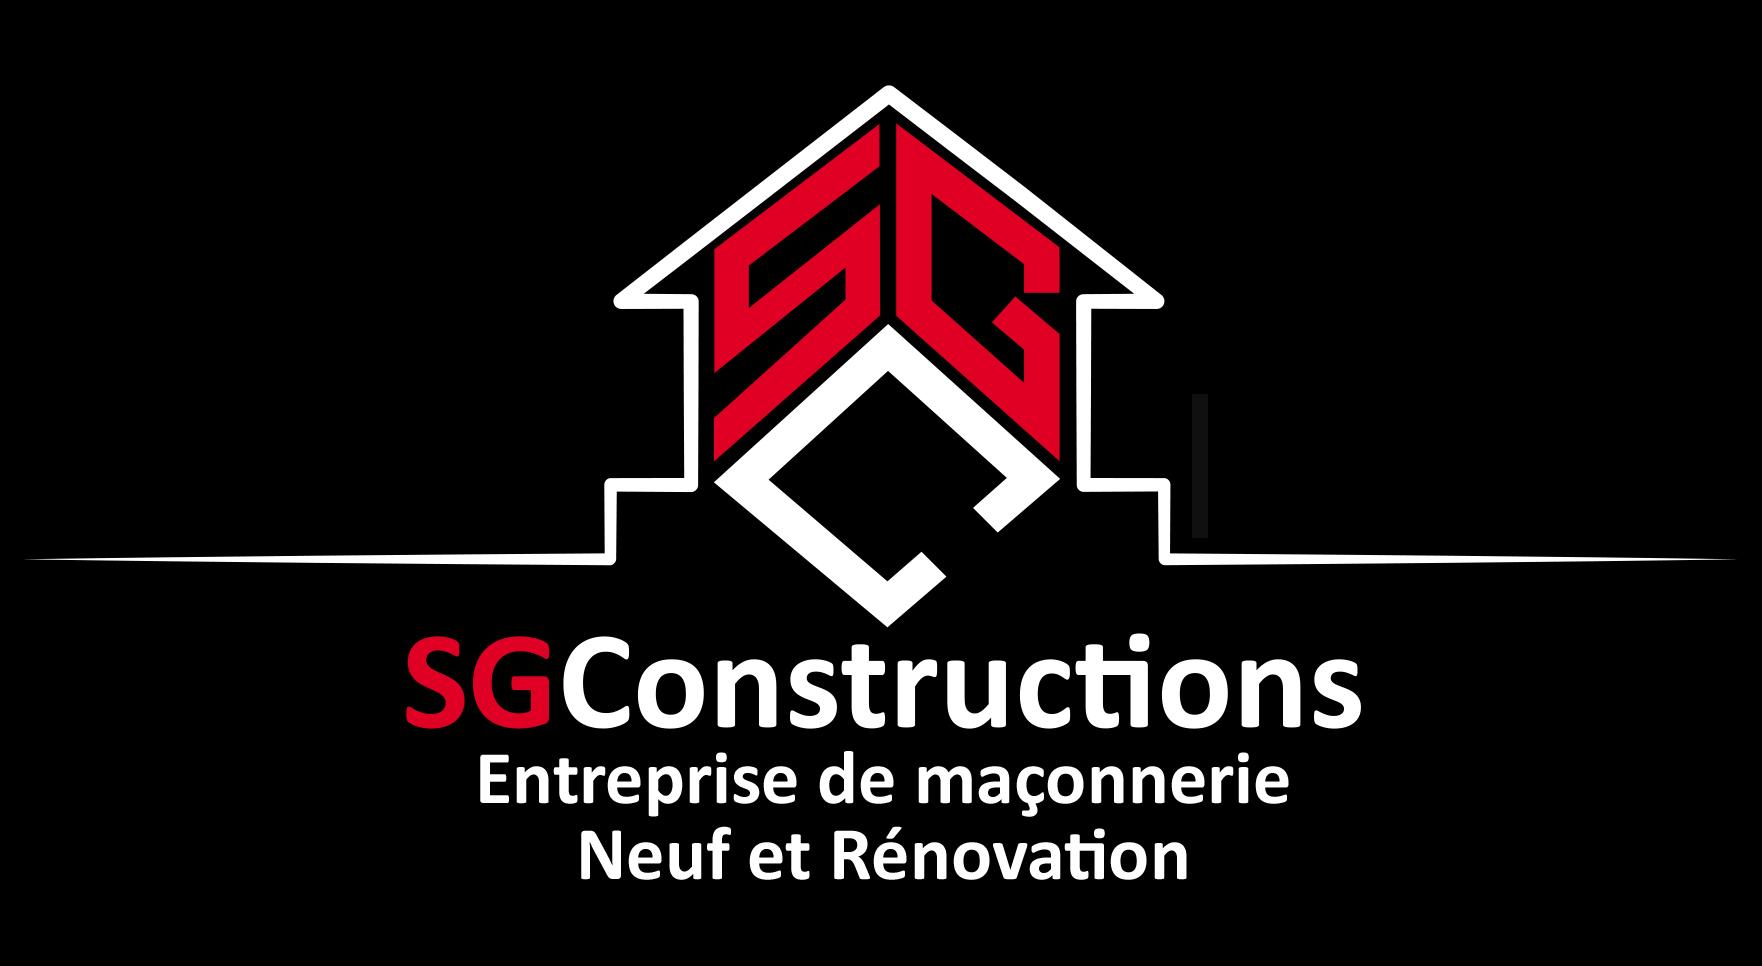 sgconstructionslogo